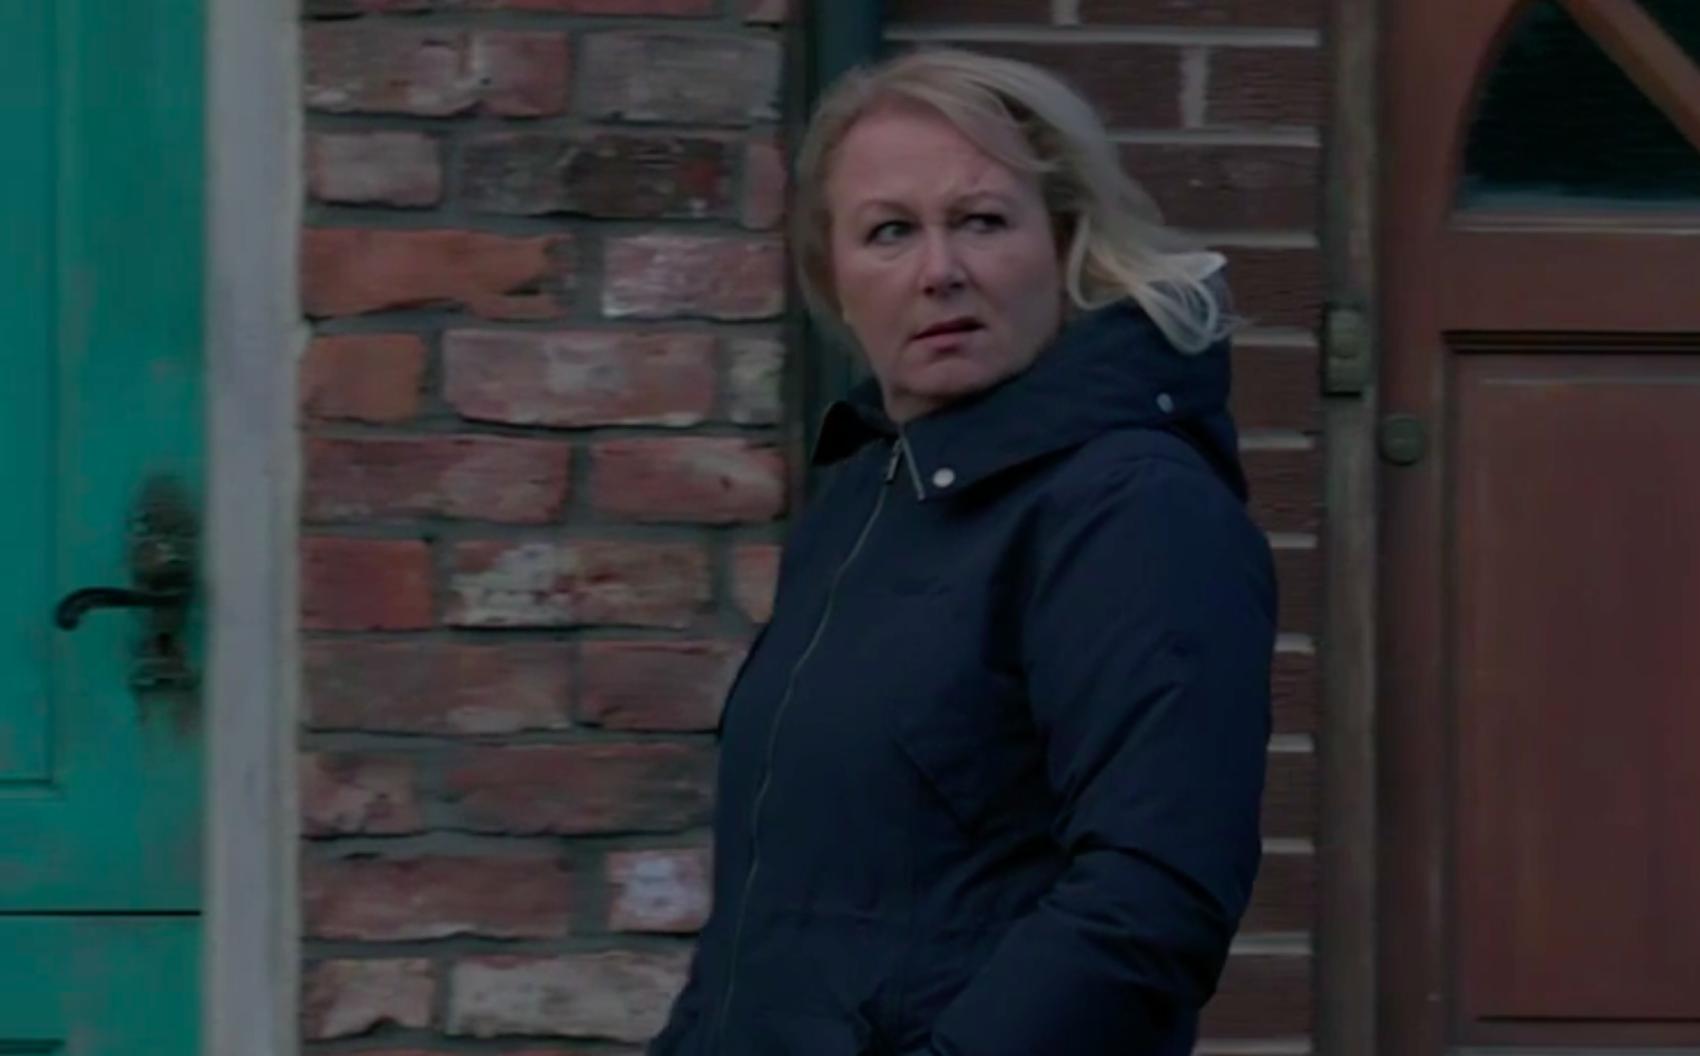 Coronation Street fans furious as Eileen ignores Geoff abusing Yasmeen